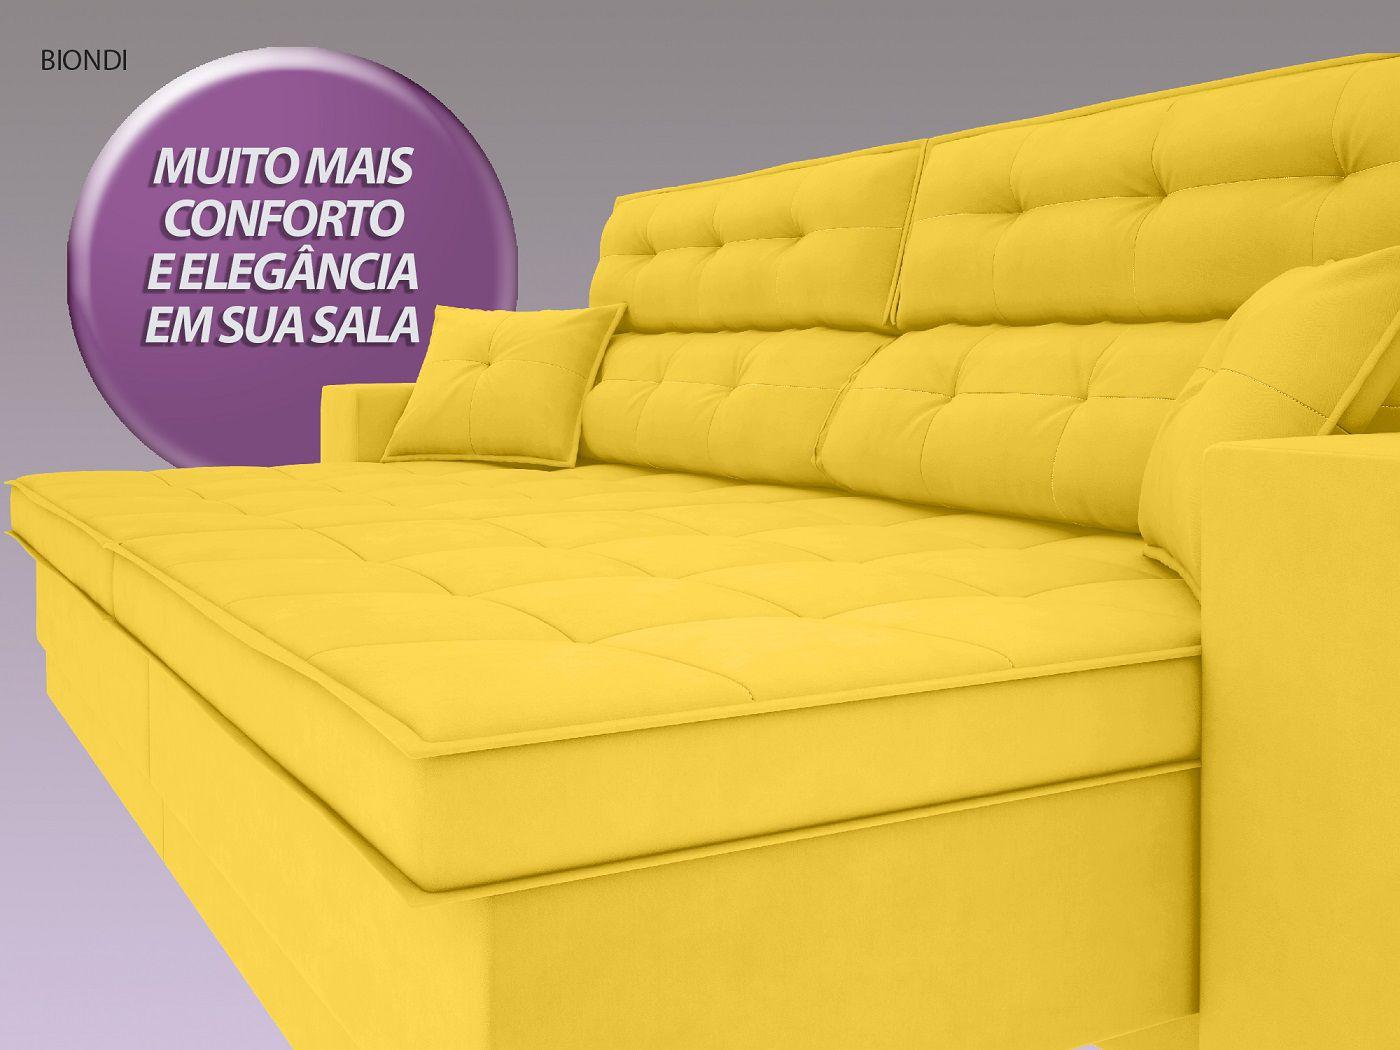 Sofá New Biondi 2,90m Retrátil e Reclinável Velosuede Canario  - NETSOFAS